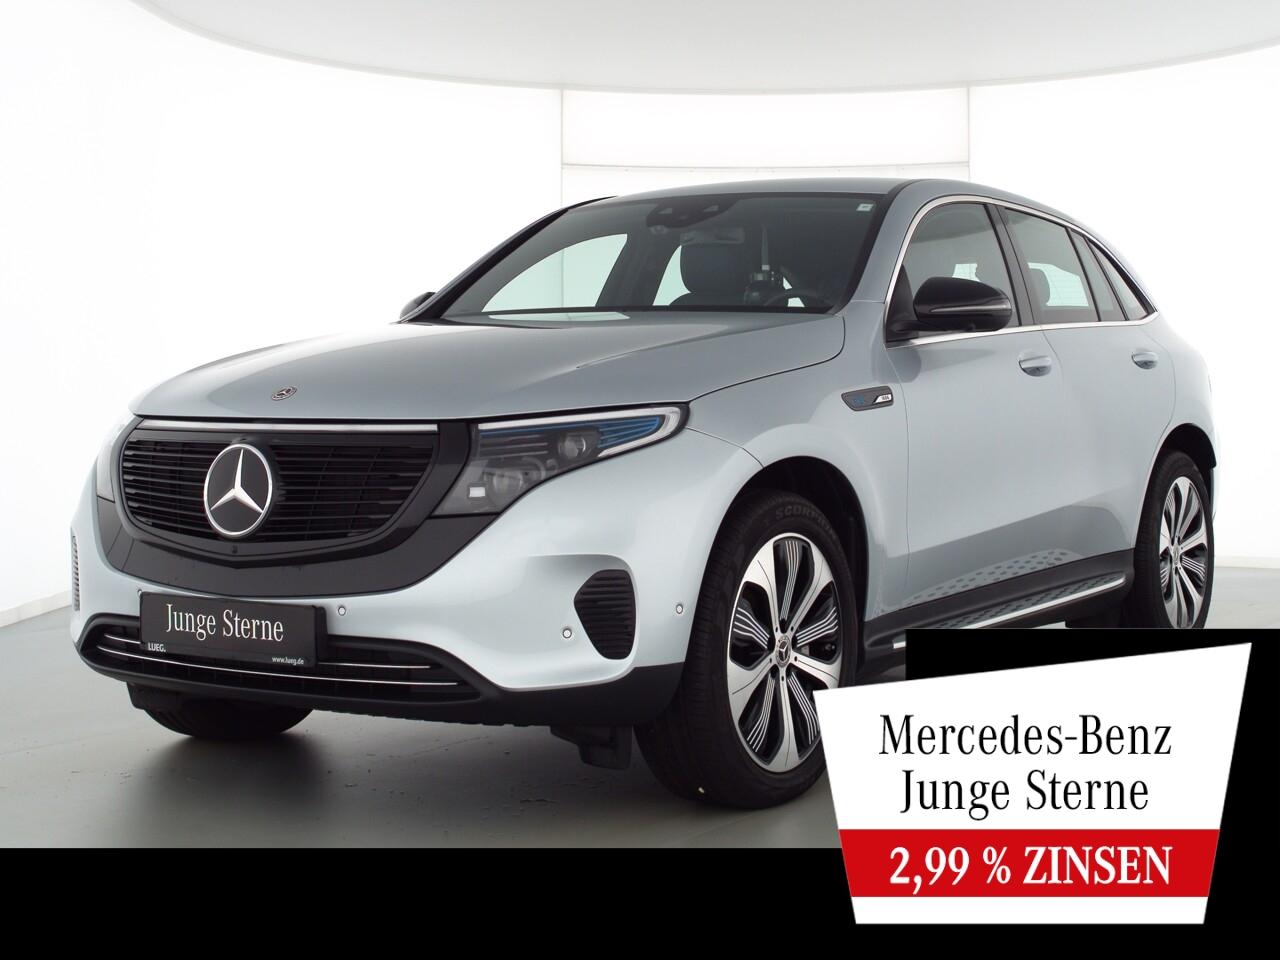 Mercedes-Benz EQC 400 4M MBUX+Burm+Mbeam+20+Fahrassist+Mem+360, Jahr 2020, Elektro